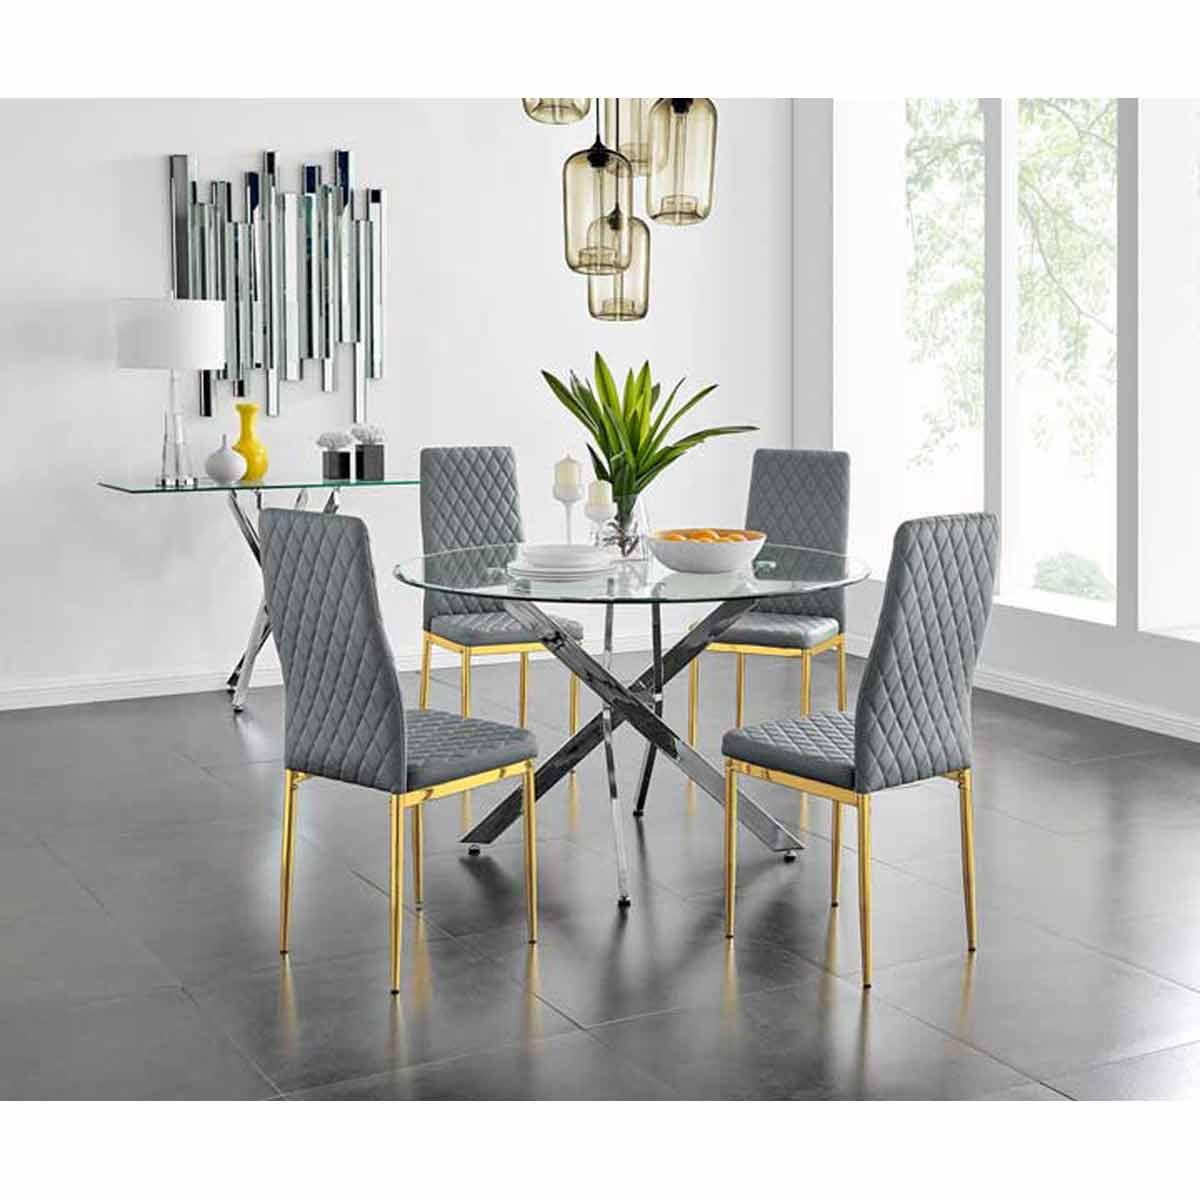 Furniture Box Novara 120cm Round Dining Table and 4 Grey Gold Leg Milan Chairs